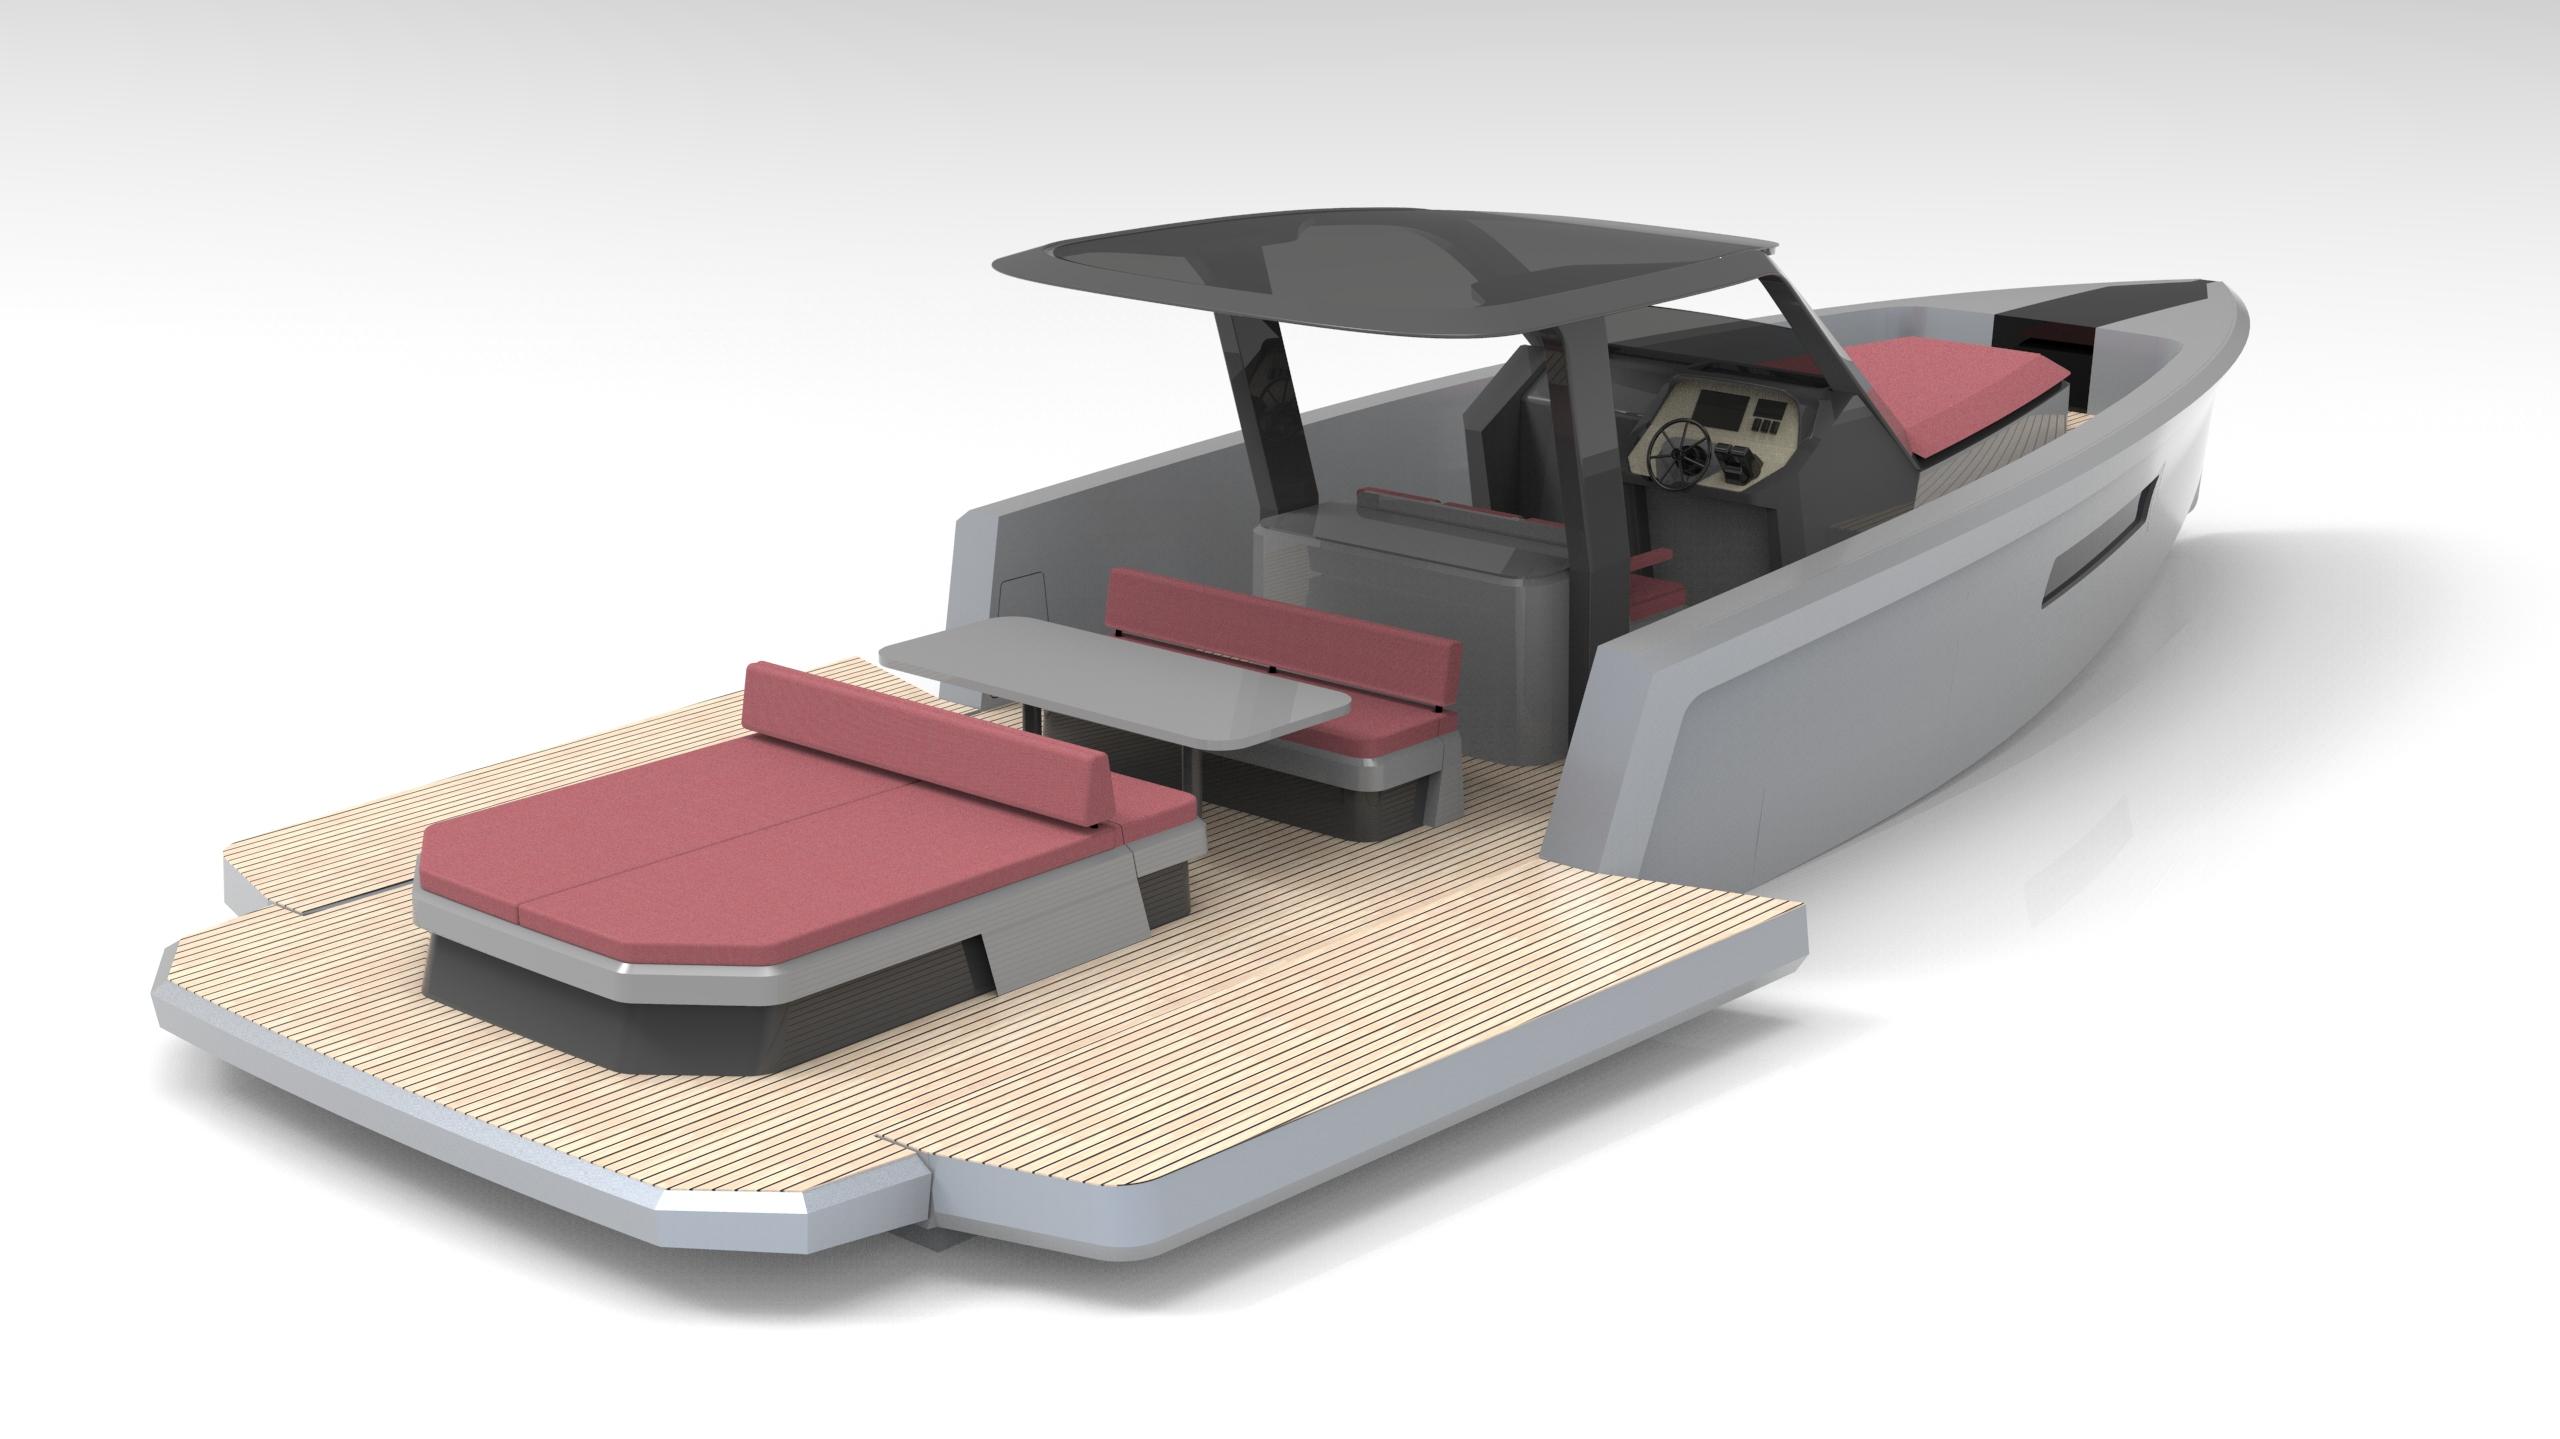 SwissCraft 12m - Yacht Design Collective